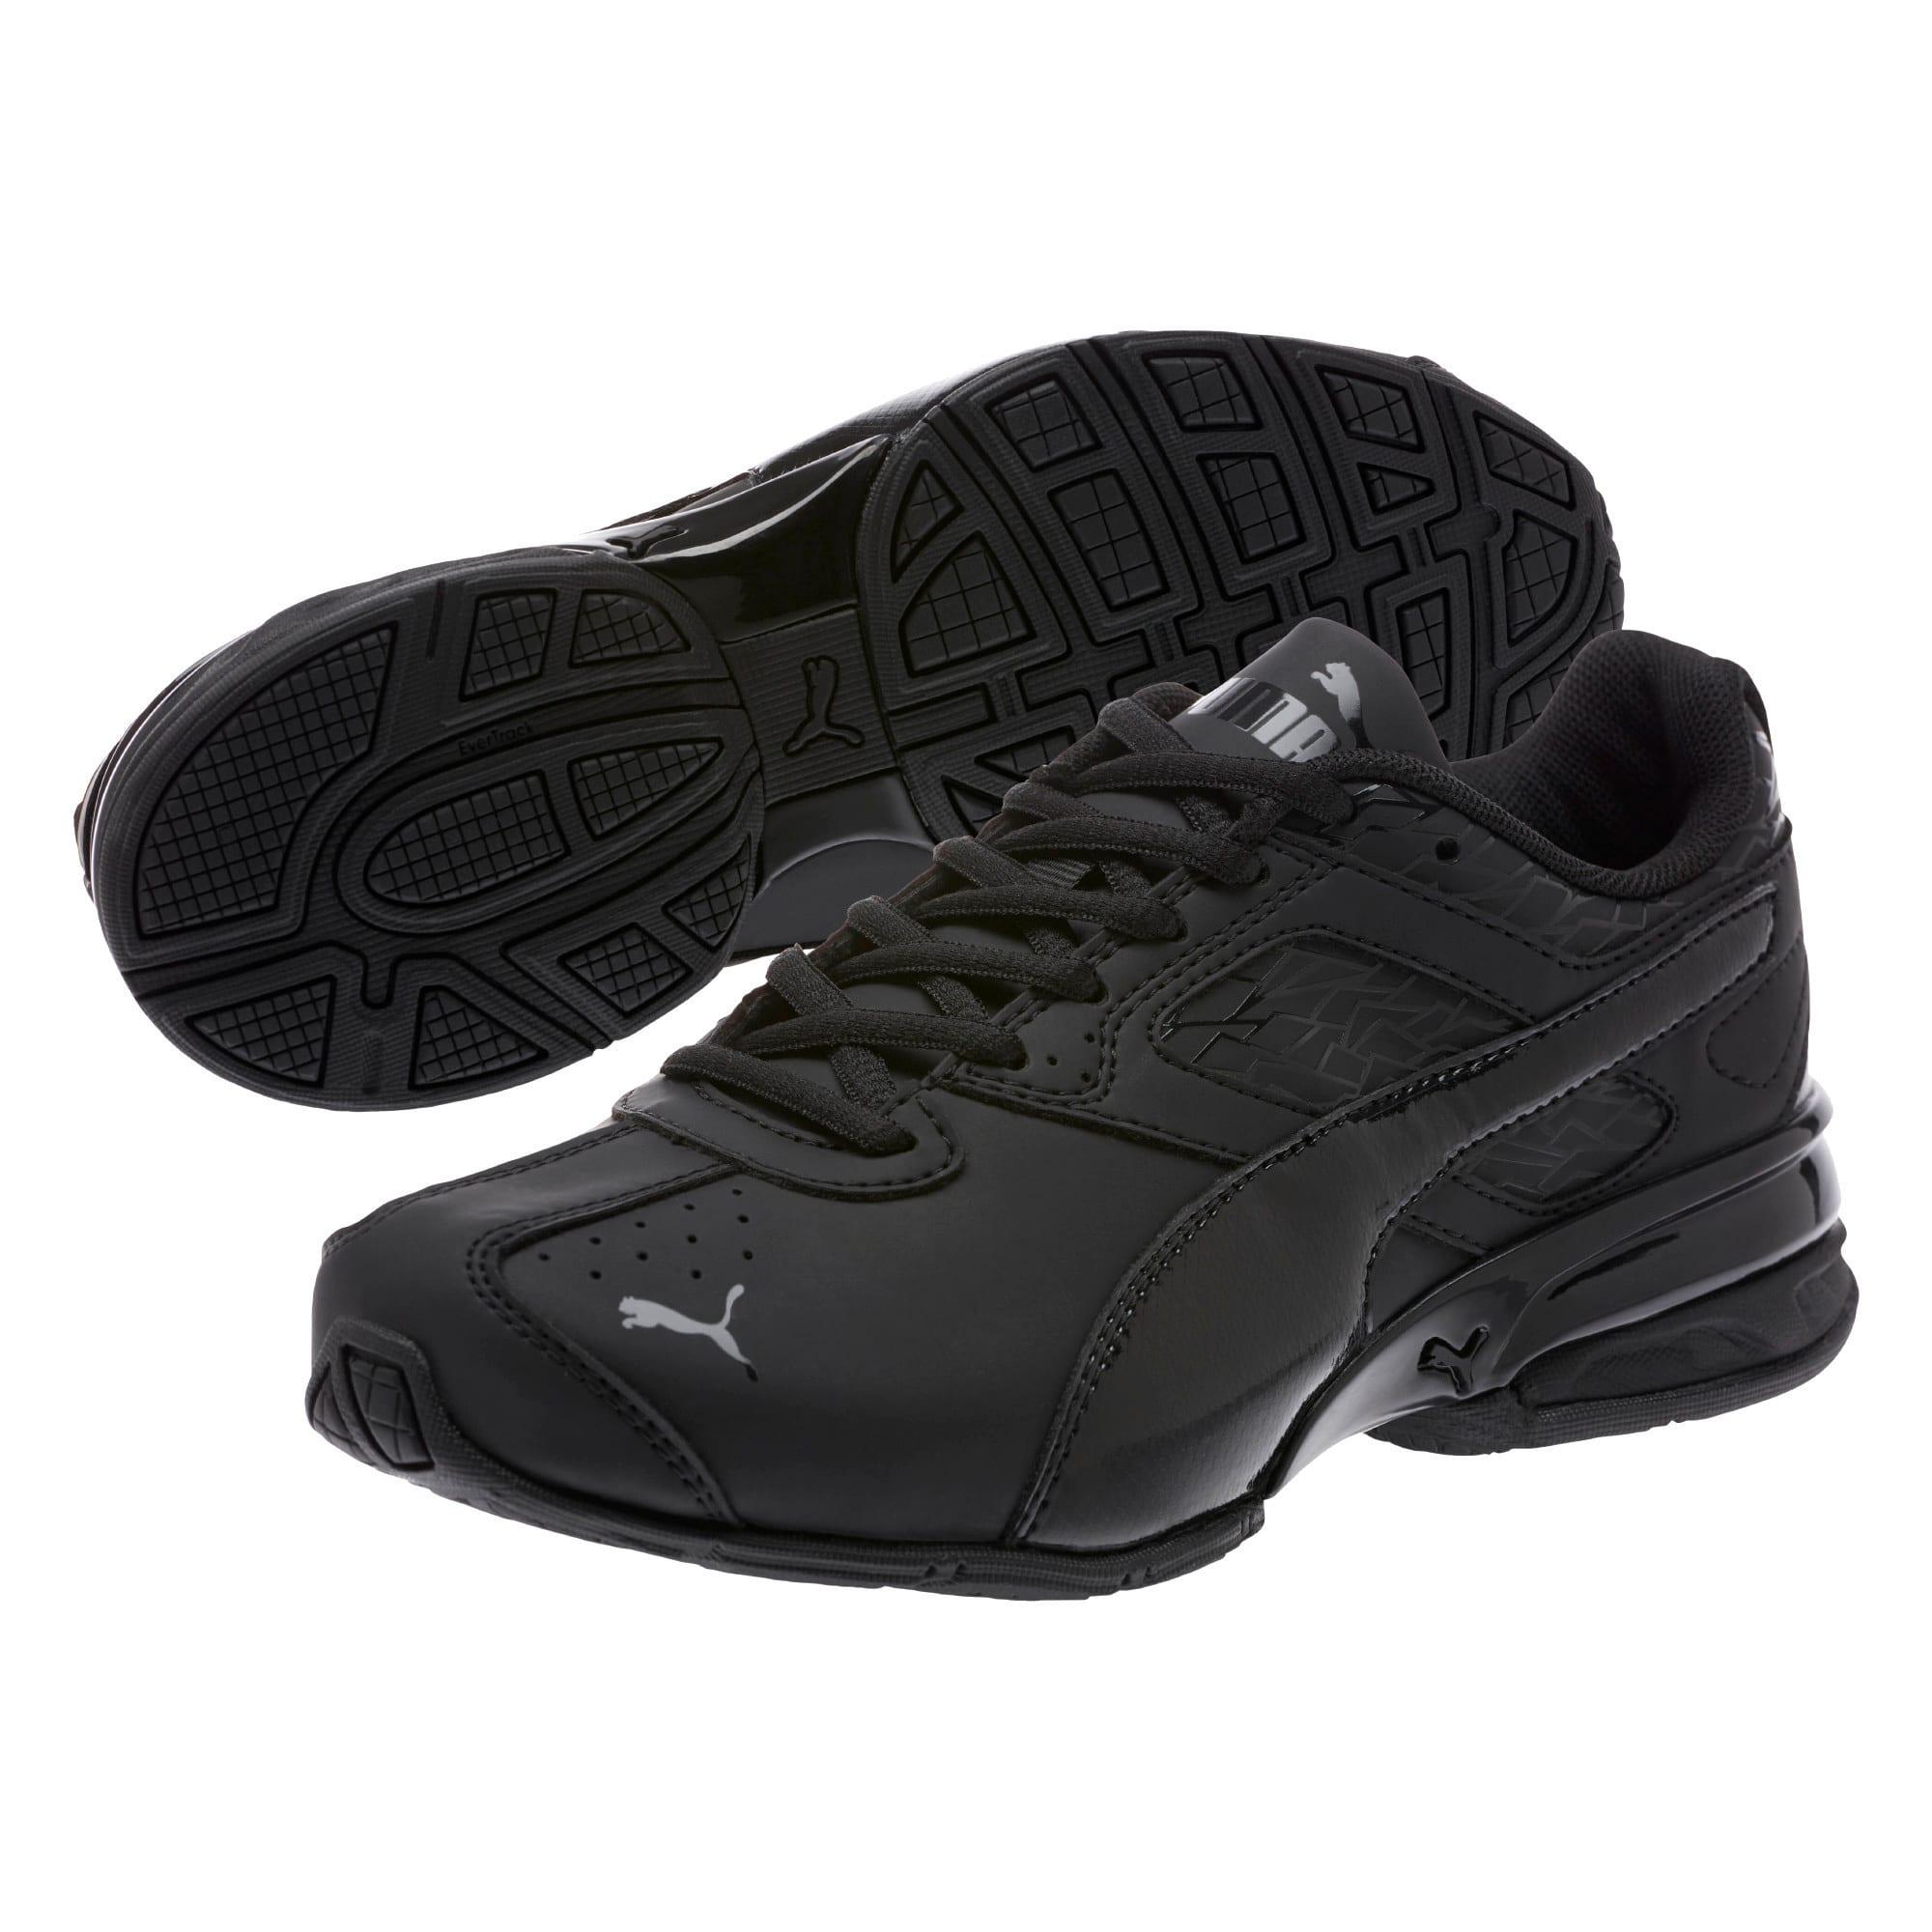 Thumbnail 1 of Tazon 6 Fracture FM Sneakers JR, Puma Black, medium